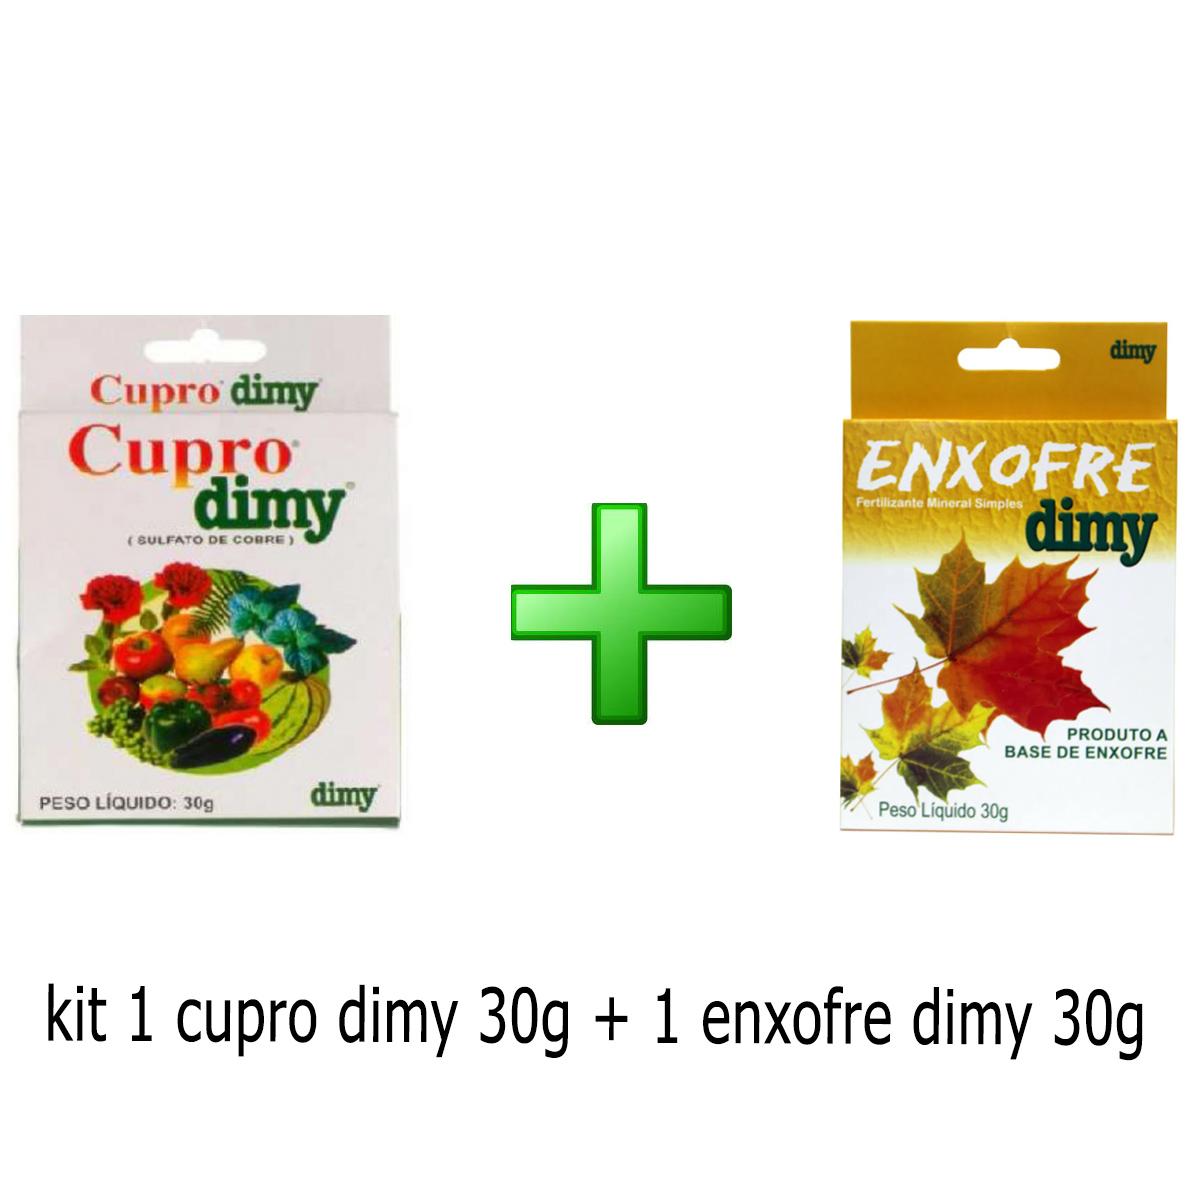 KIT 1 ENXOFRE DIMY 30G + 1 CUPRO DIMY 30G